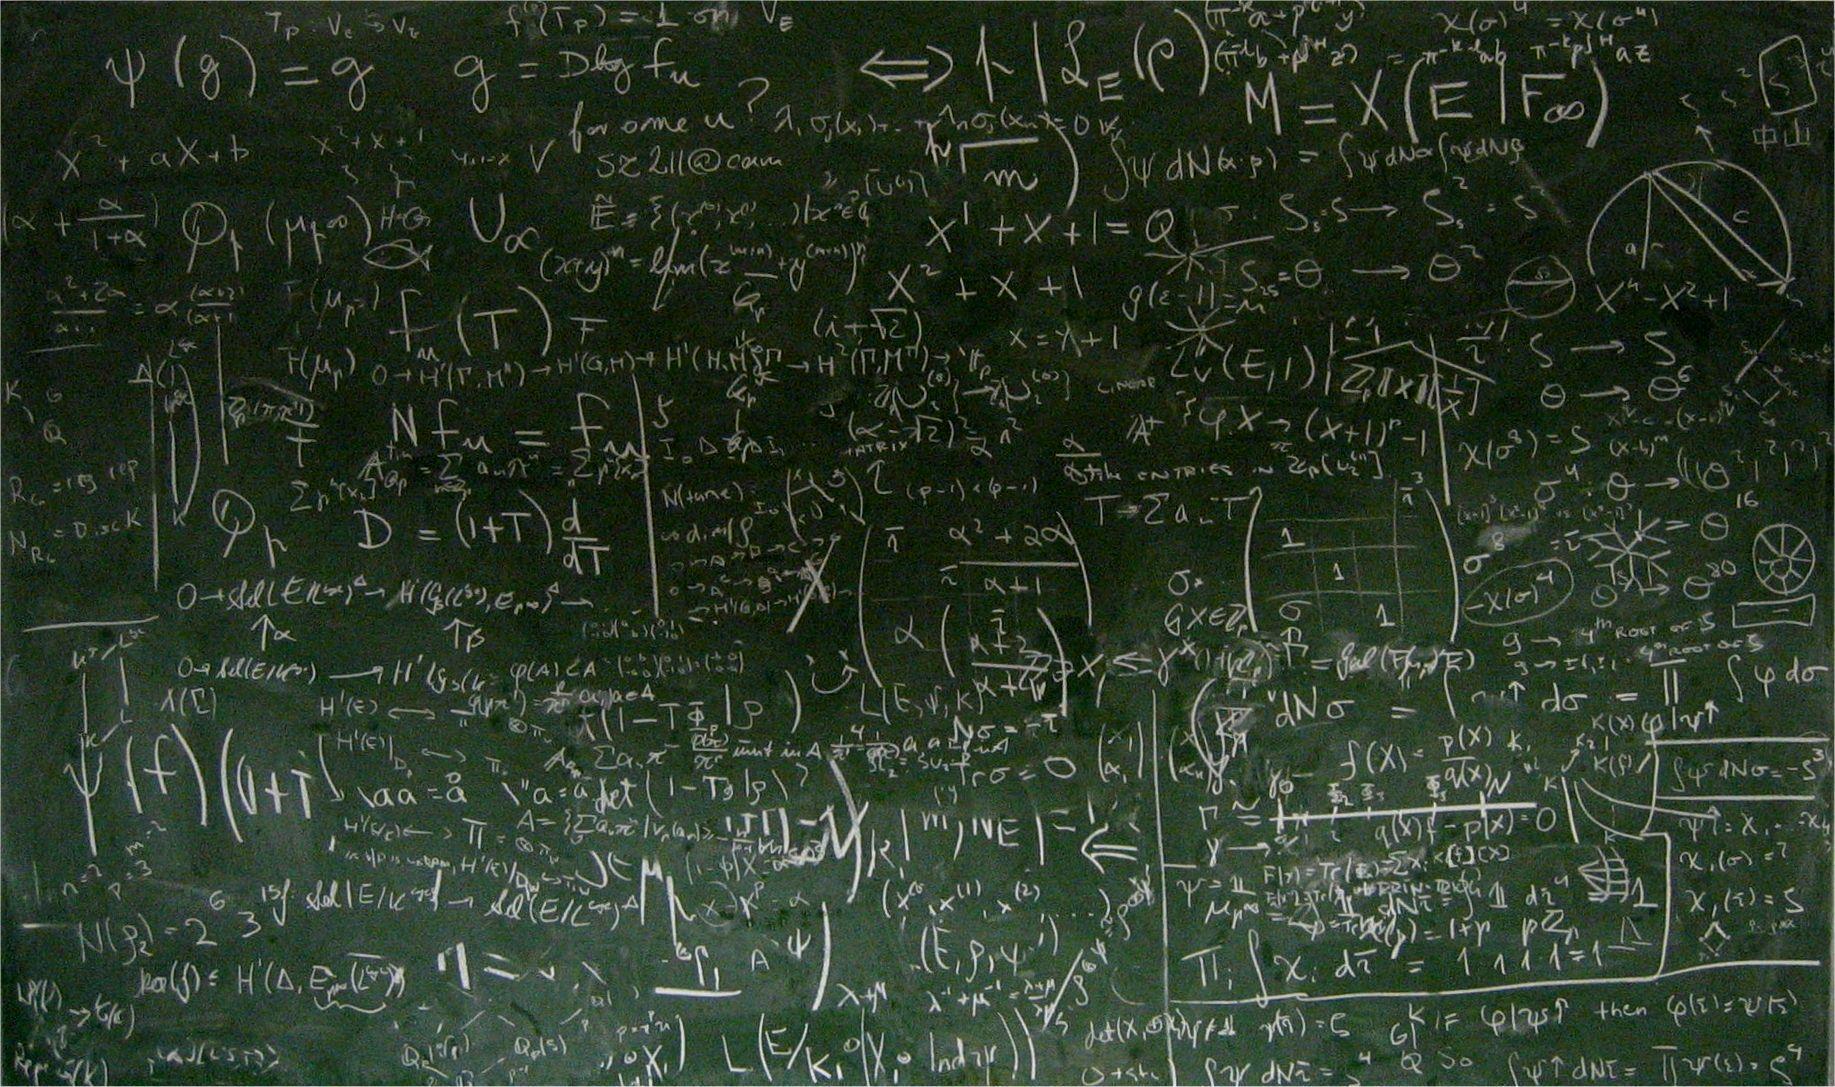 Physics Equations Wallpaper - WallpaperSafari